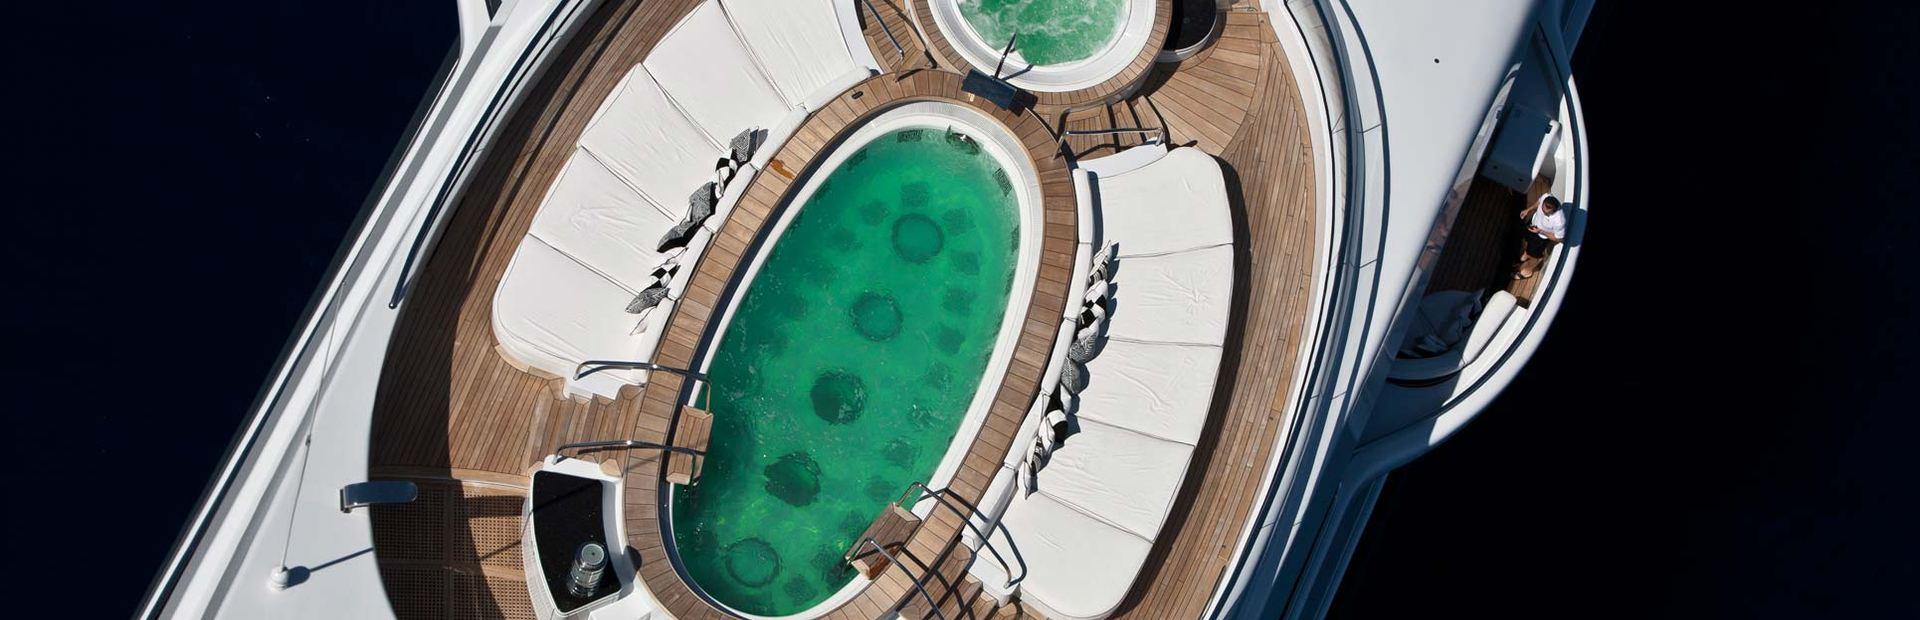 Lurssen Yachts  Profile Photo